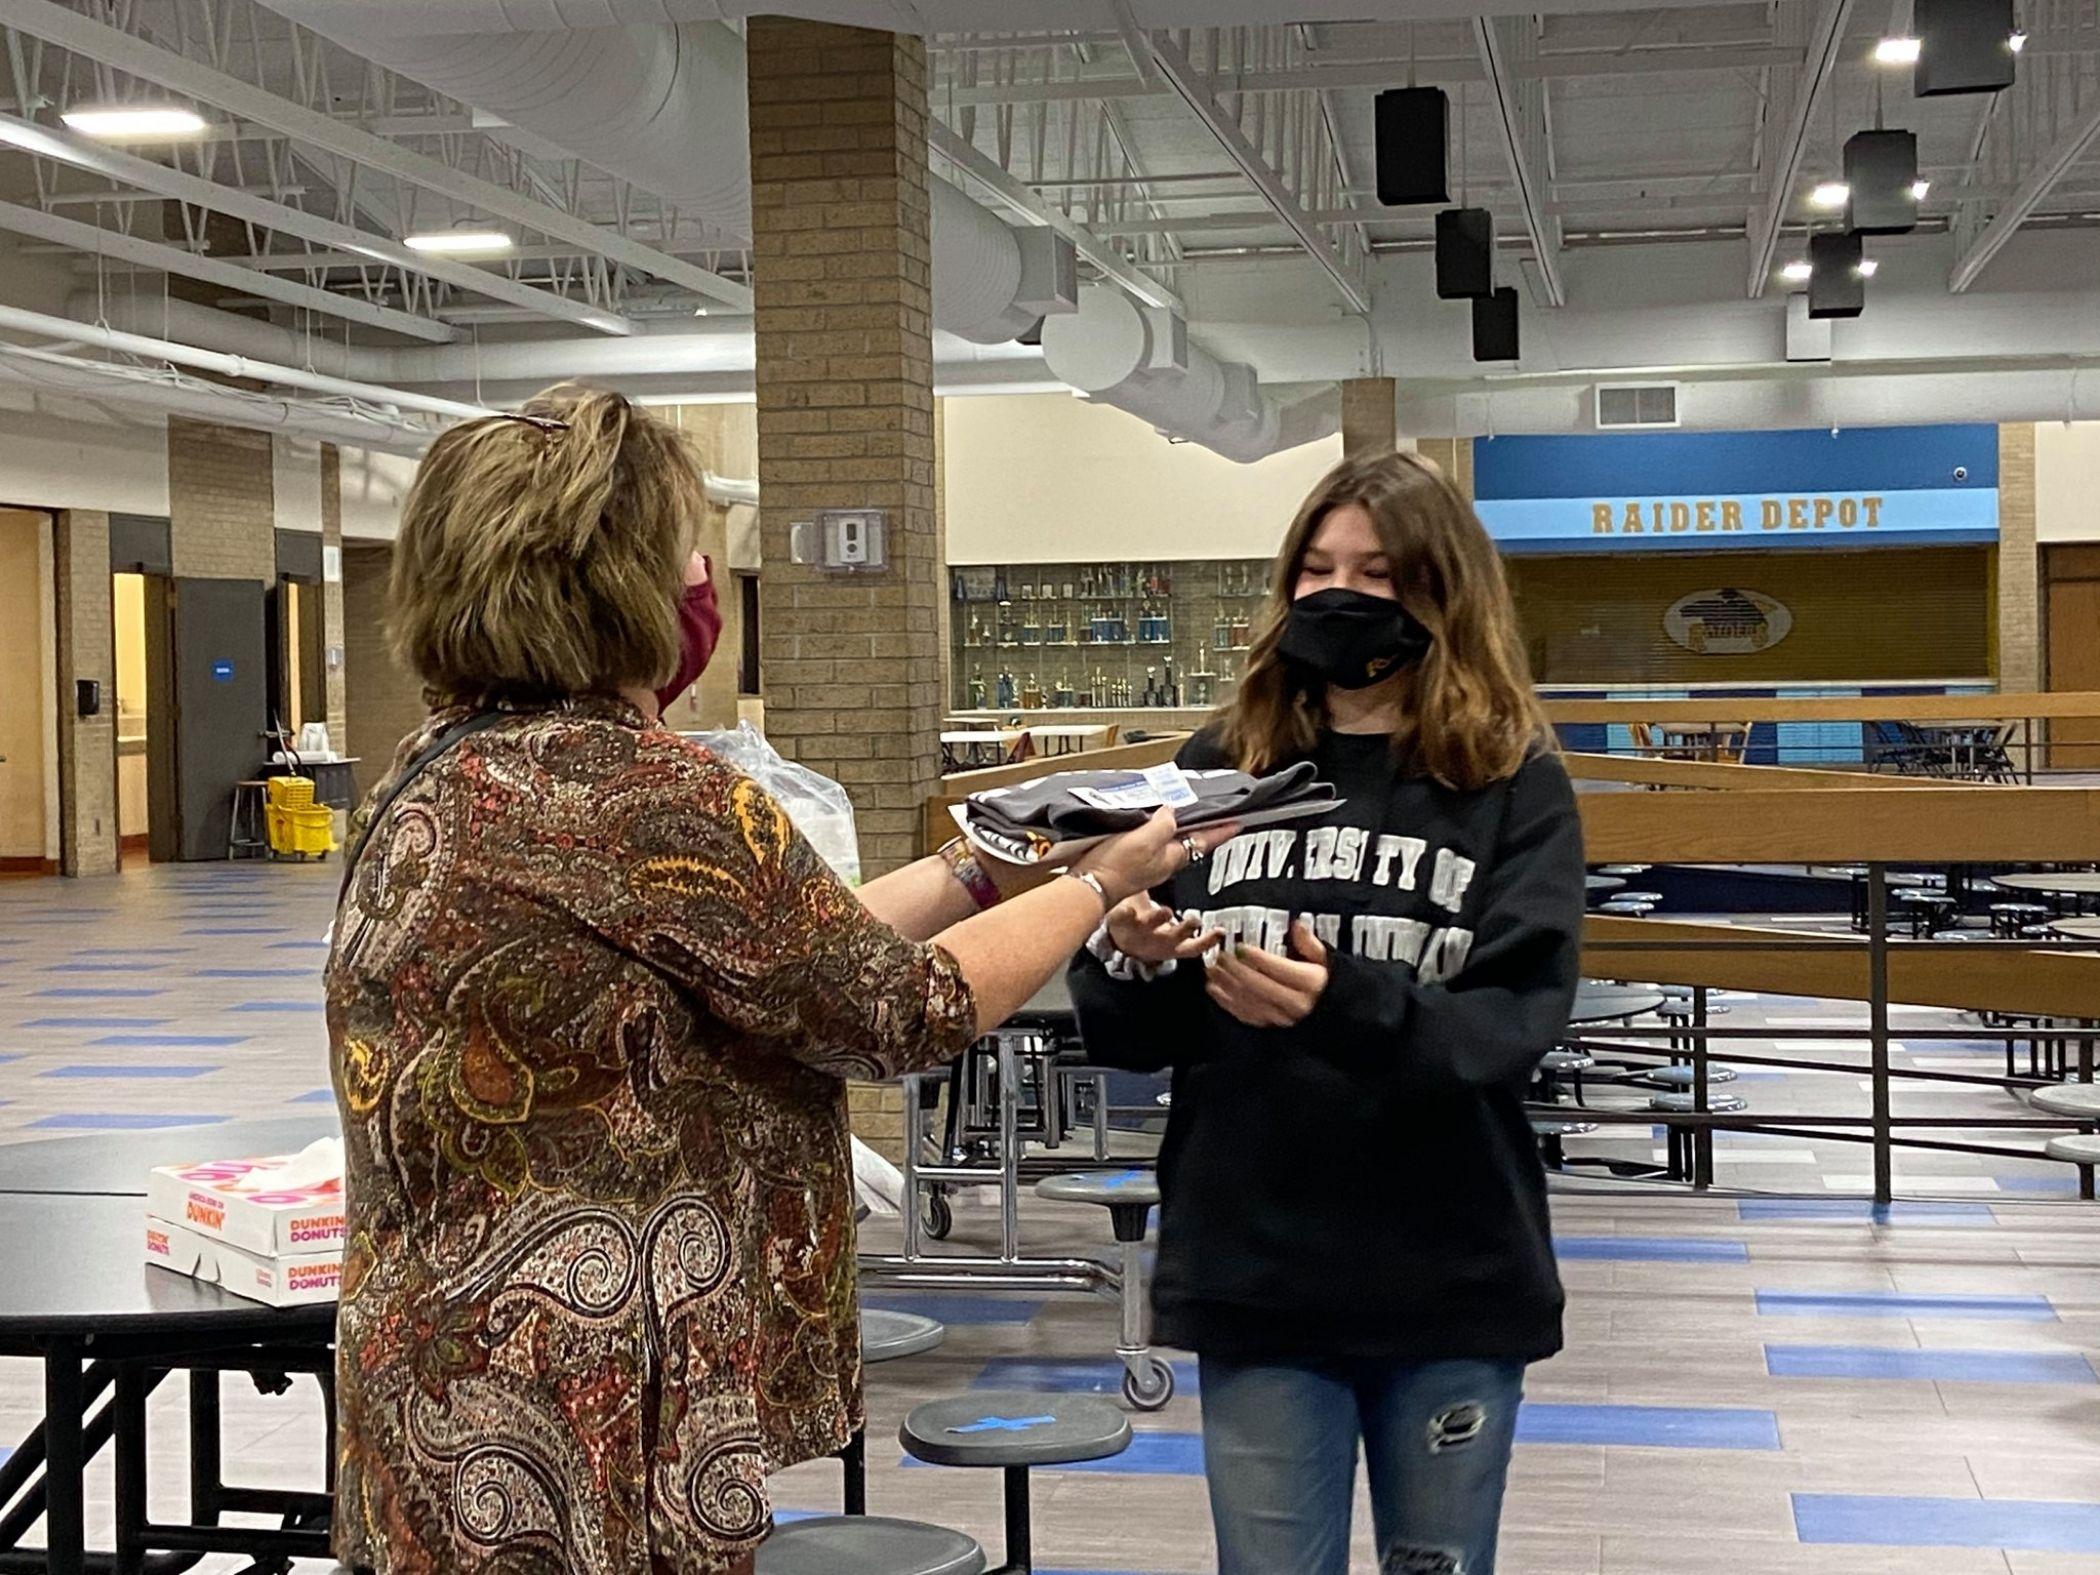 Principal hands student items